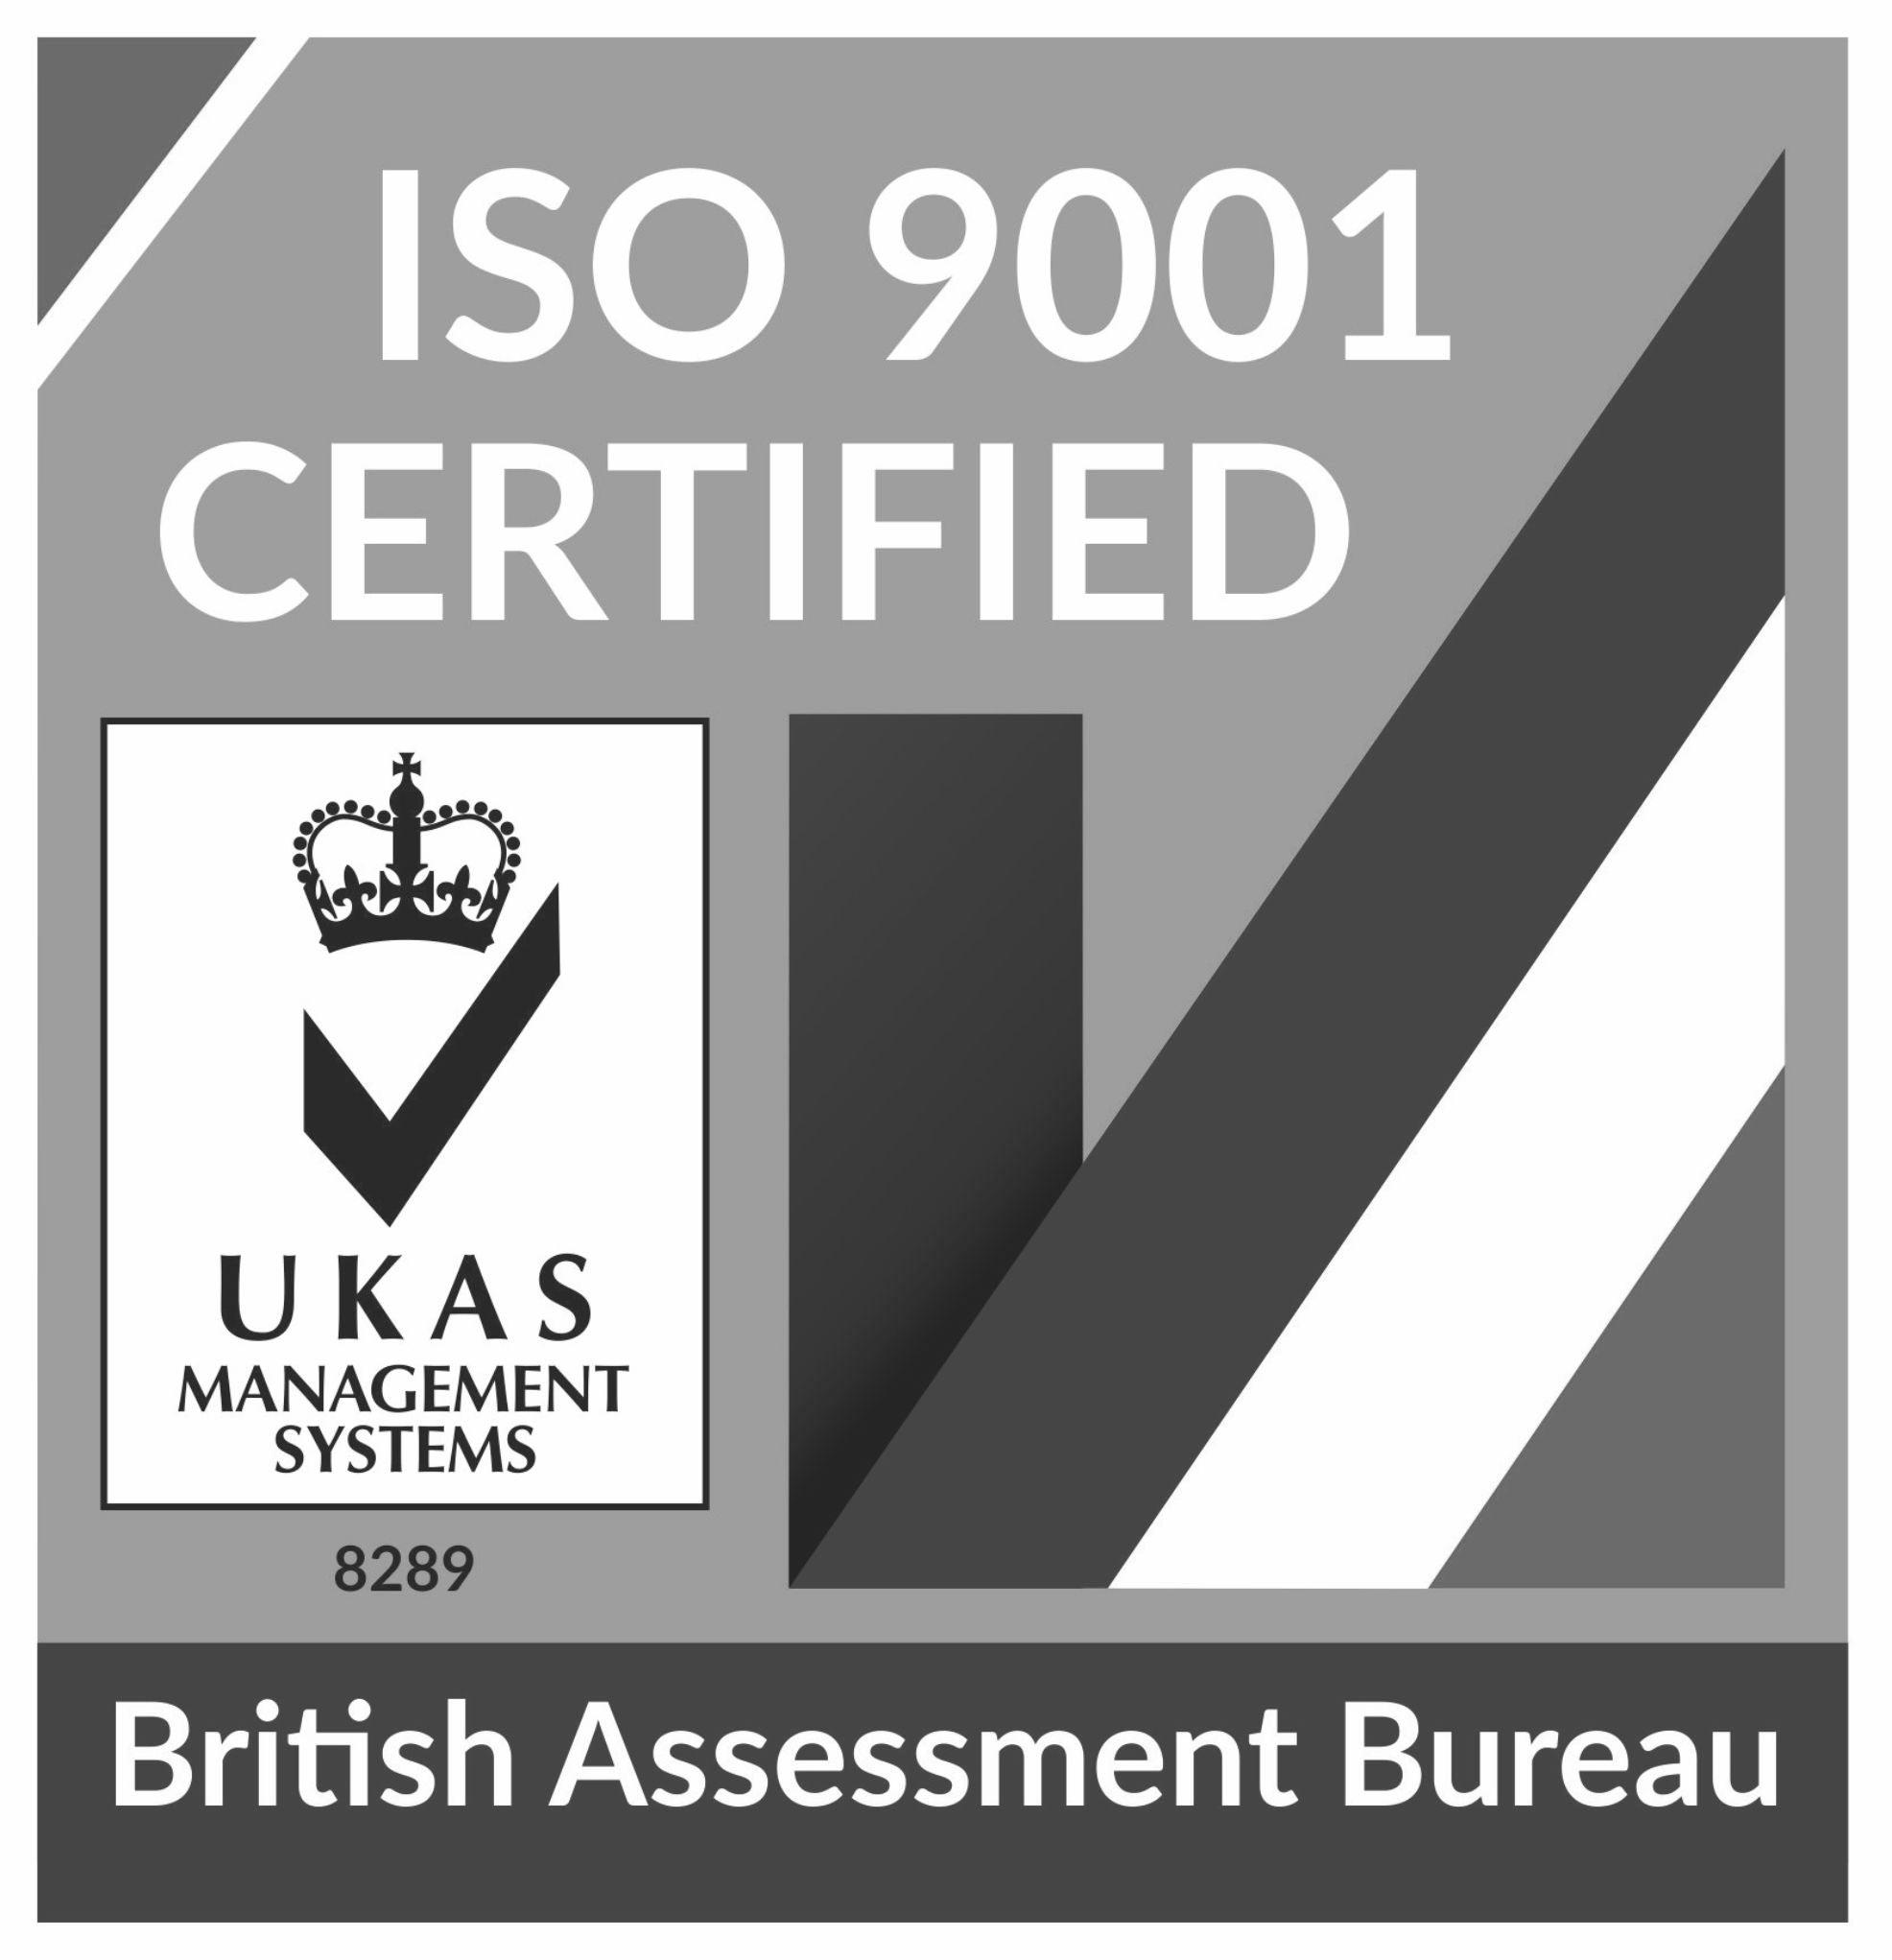 UKAS-ISO-9001(b&w)